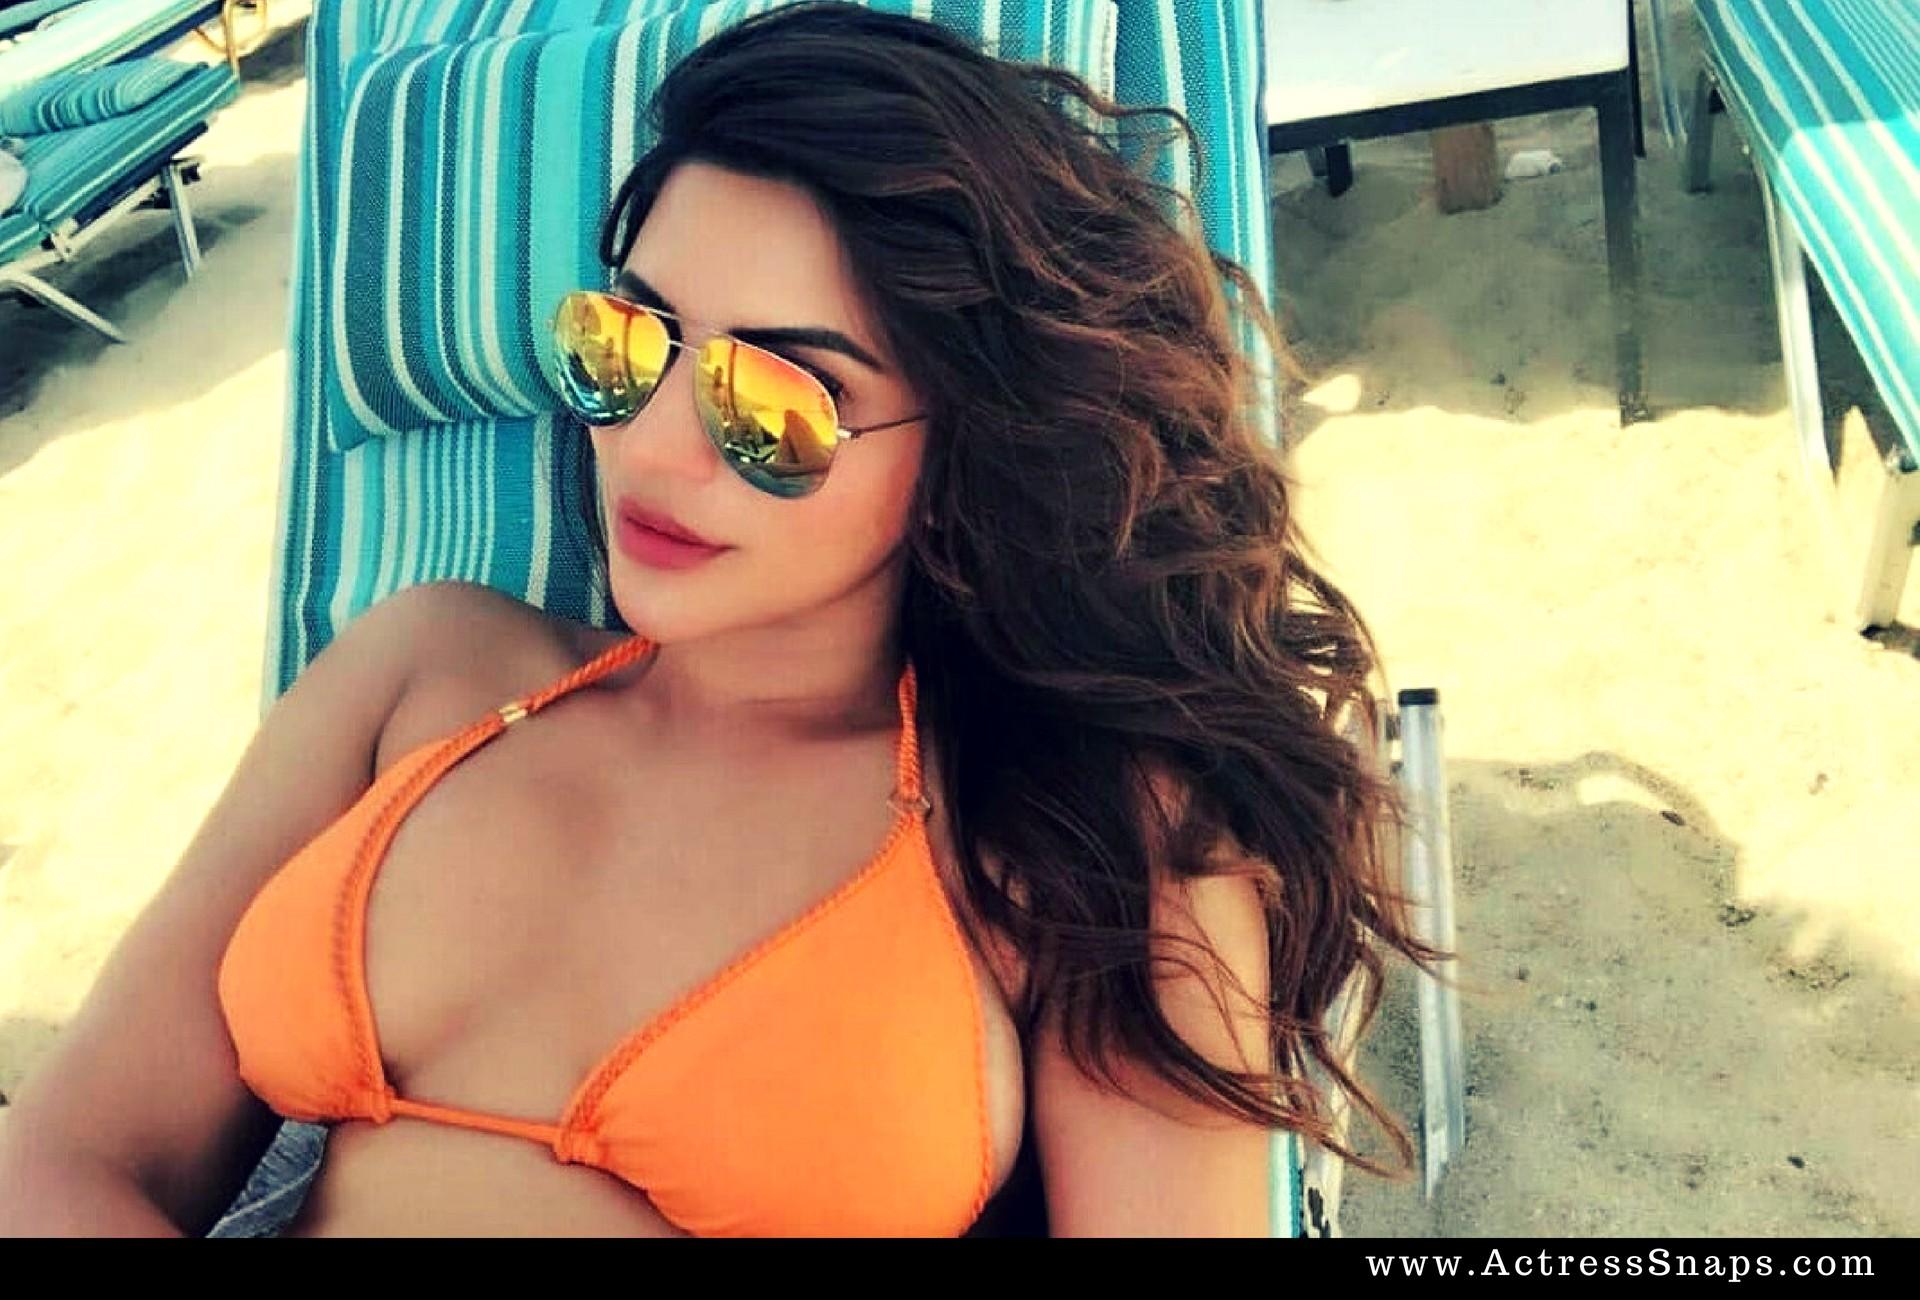 Sexy Shama Sikander Bikini Photos - Sexy Actress Pictures   Hot Actress Pictures - ActressSnaps.com